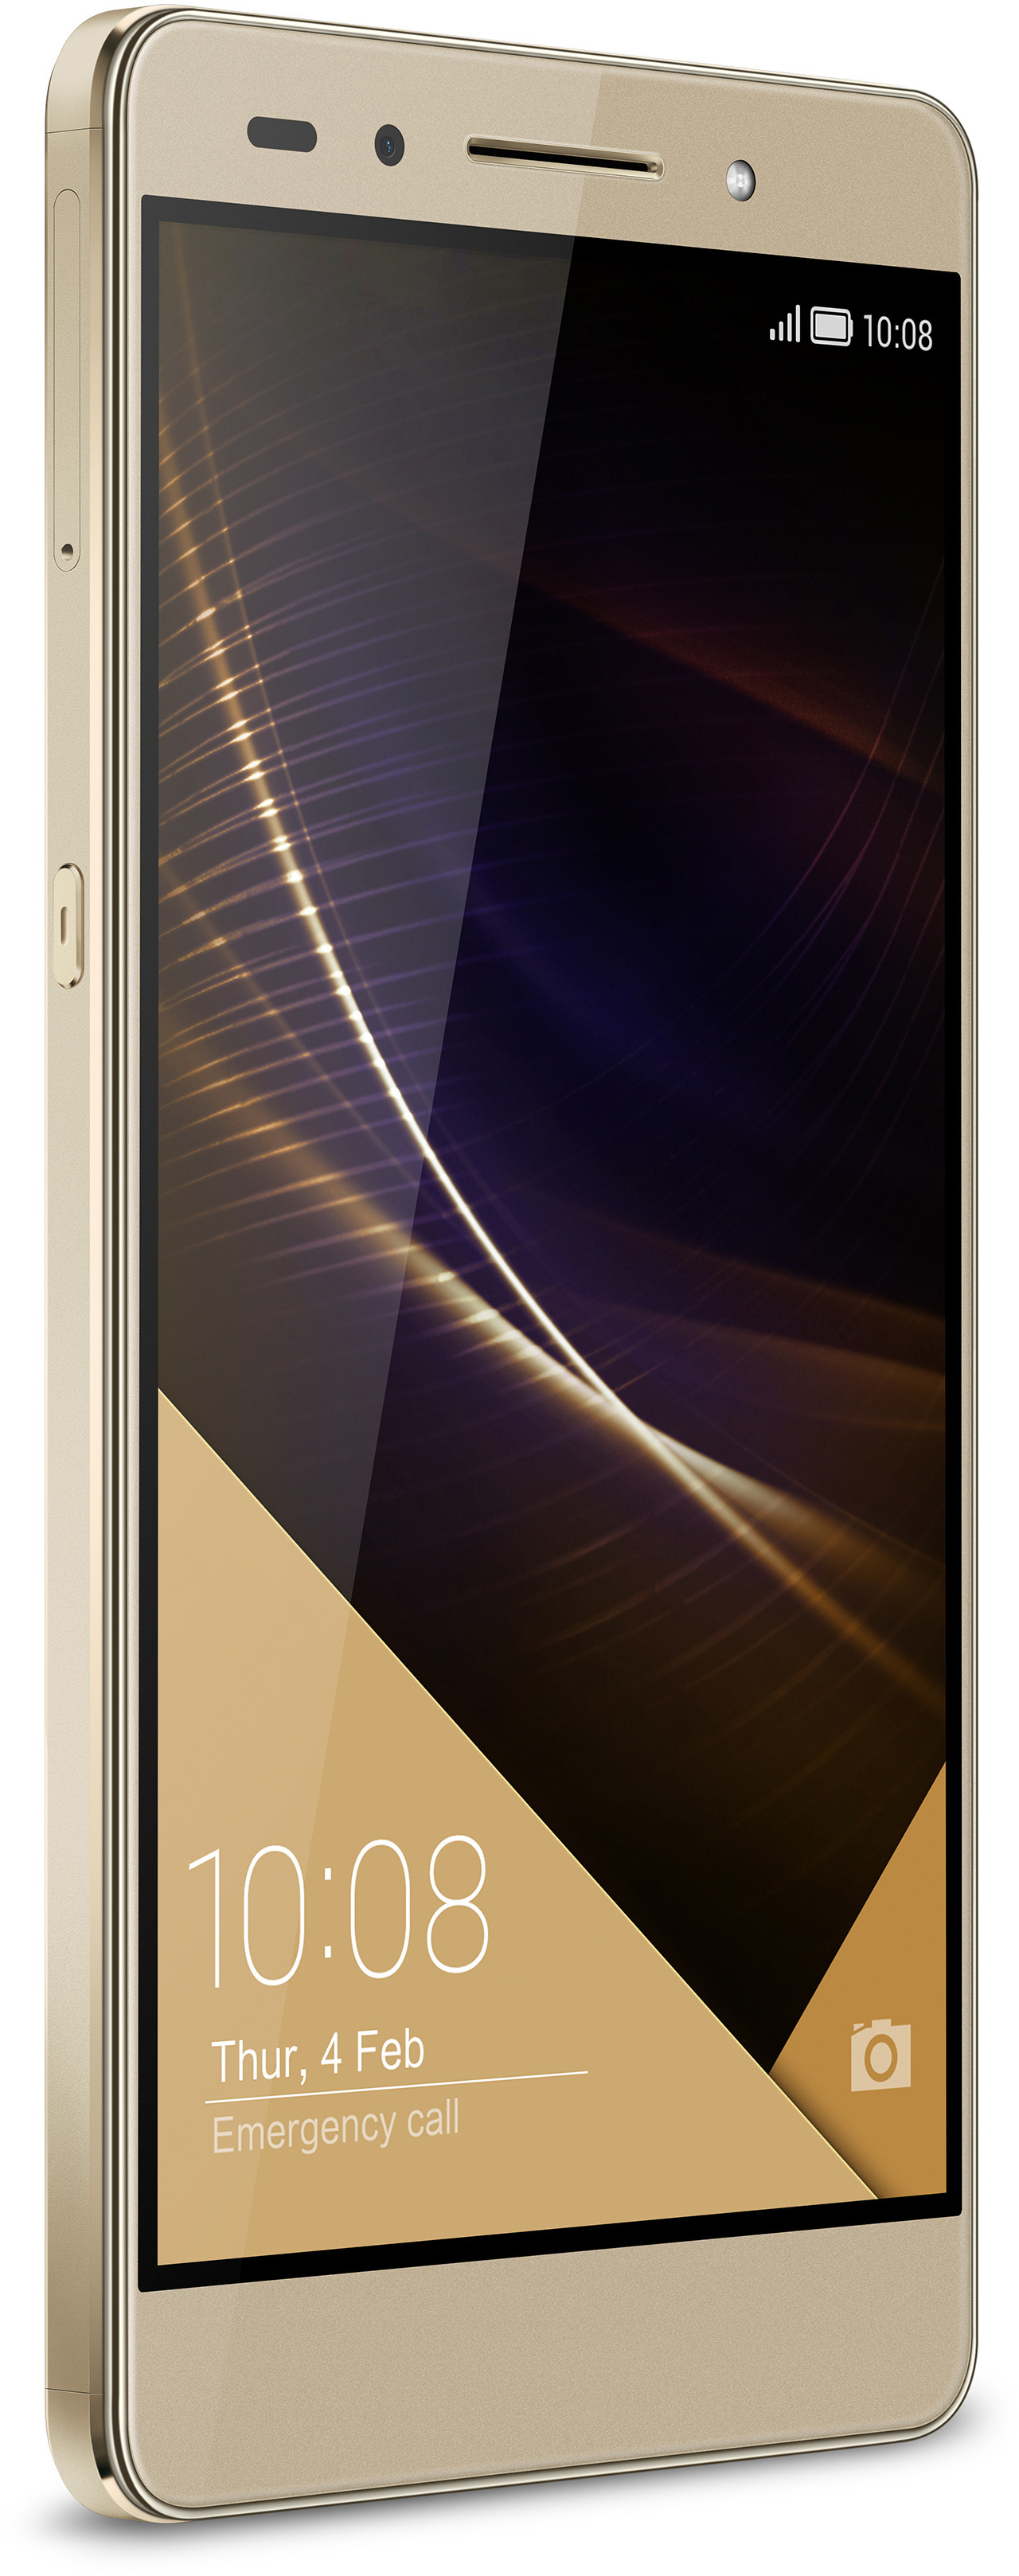 Смартфон Huawei Honor 7 Premium Dual-SIM Gold смартфон huawei honor 7 lite gold